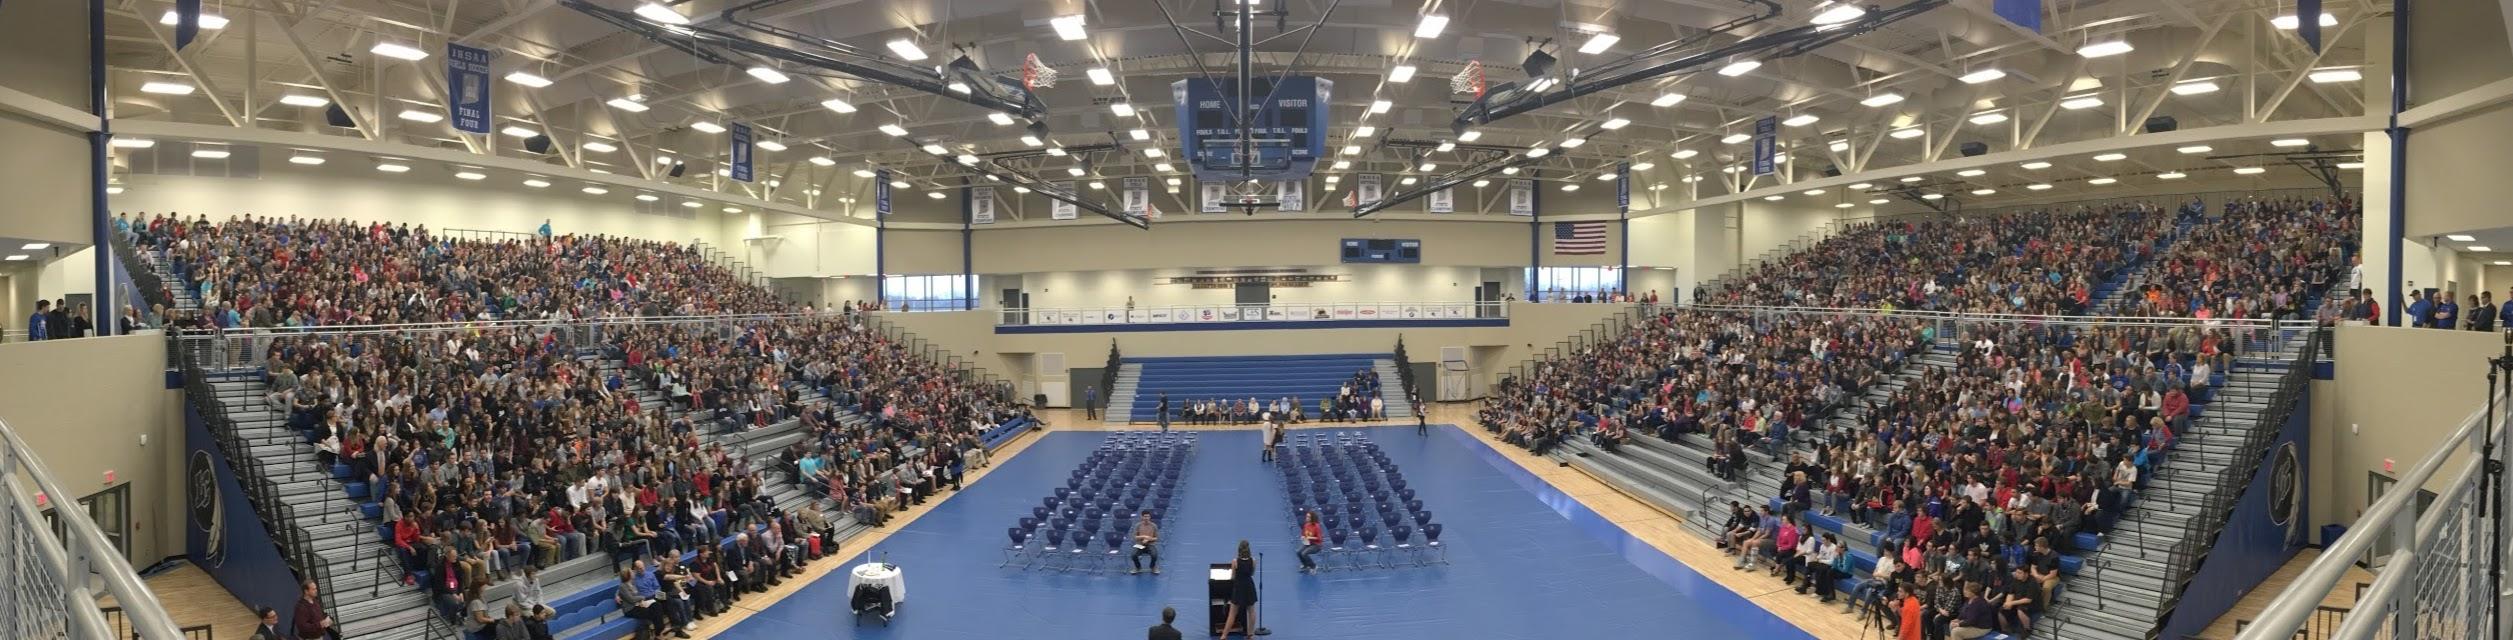 Lake Central High School gymnasium